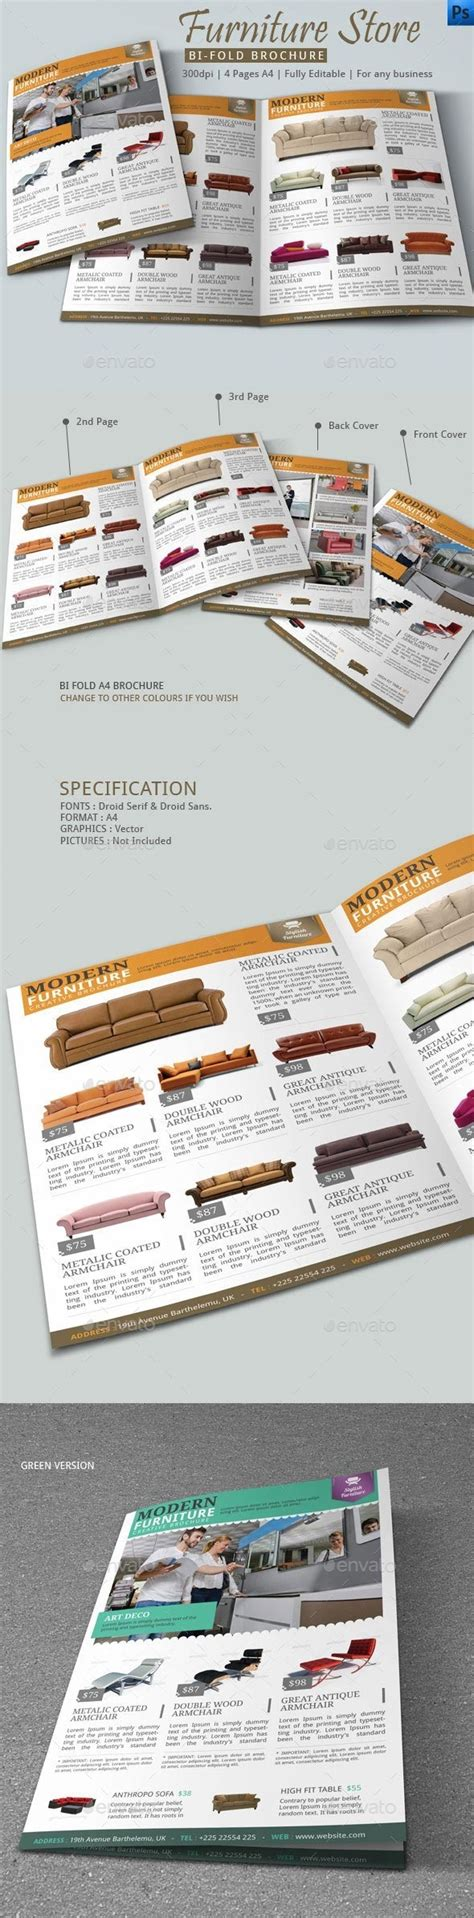 Diy Wood Furniture Tri Fold Brochure Templates Psd 187 Tinkytyler Org Stock Photos Graphics Diy Brochure Template